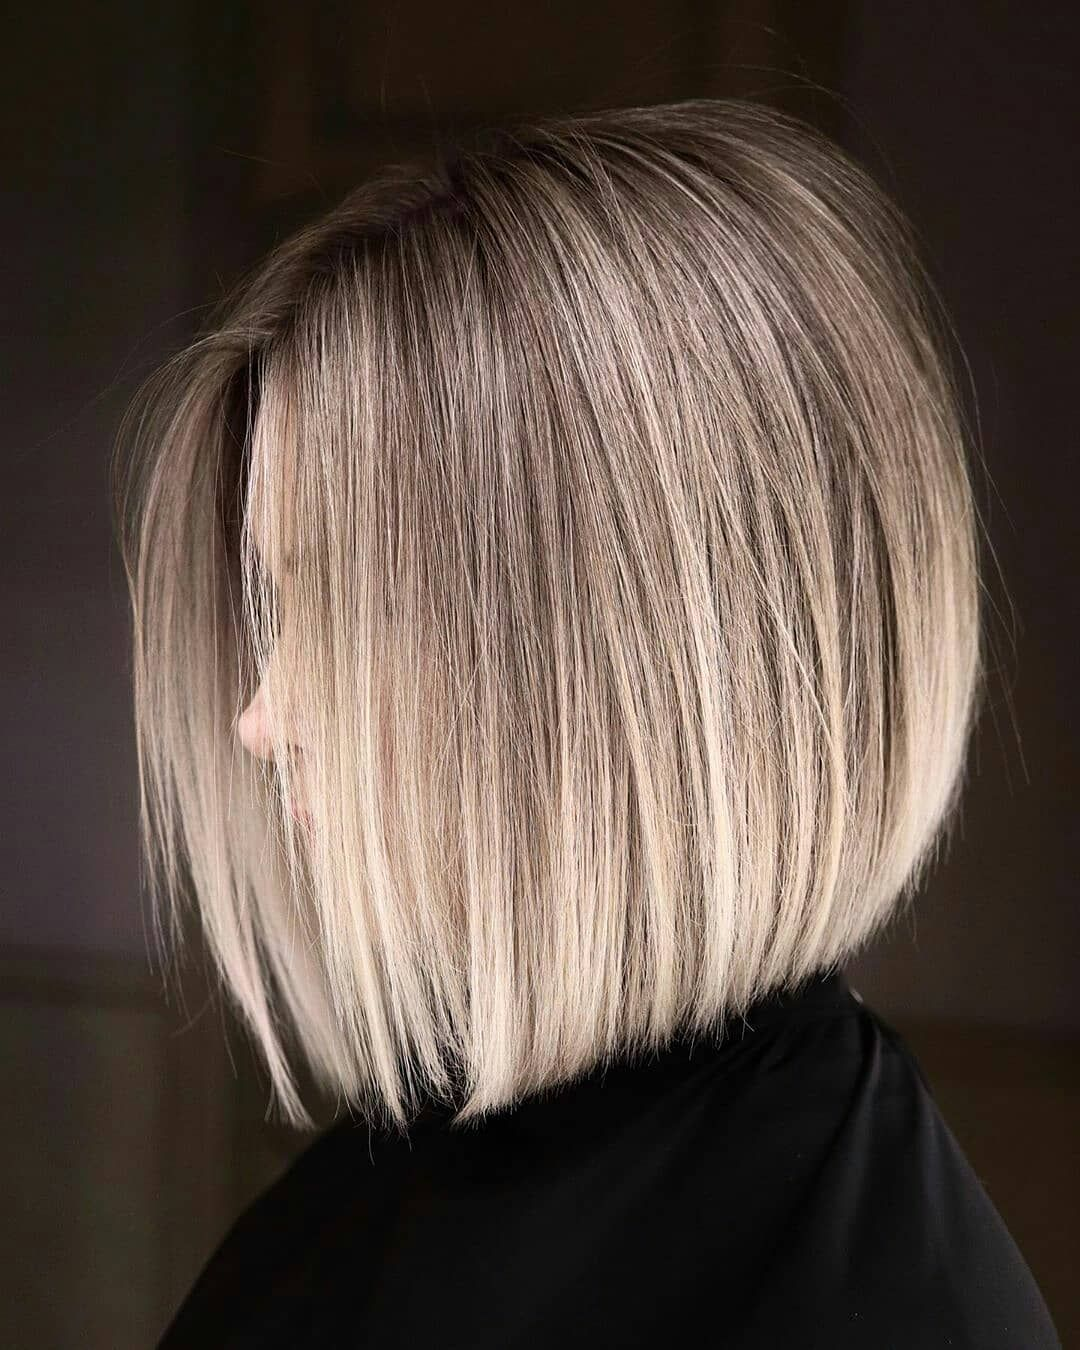 10 Short Haircut Styles for Ladies - Cute Easy Sho